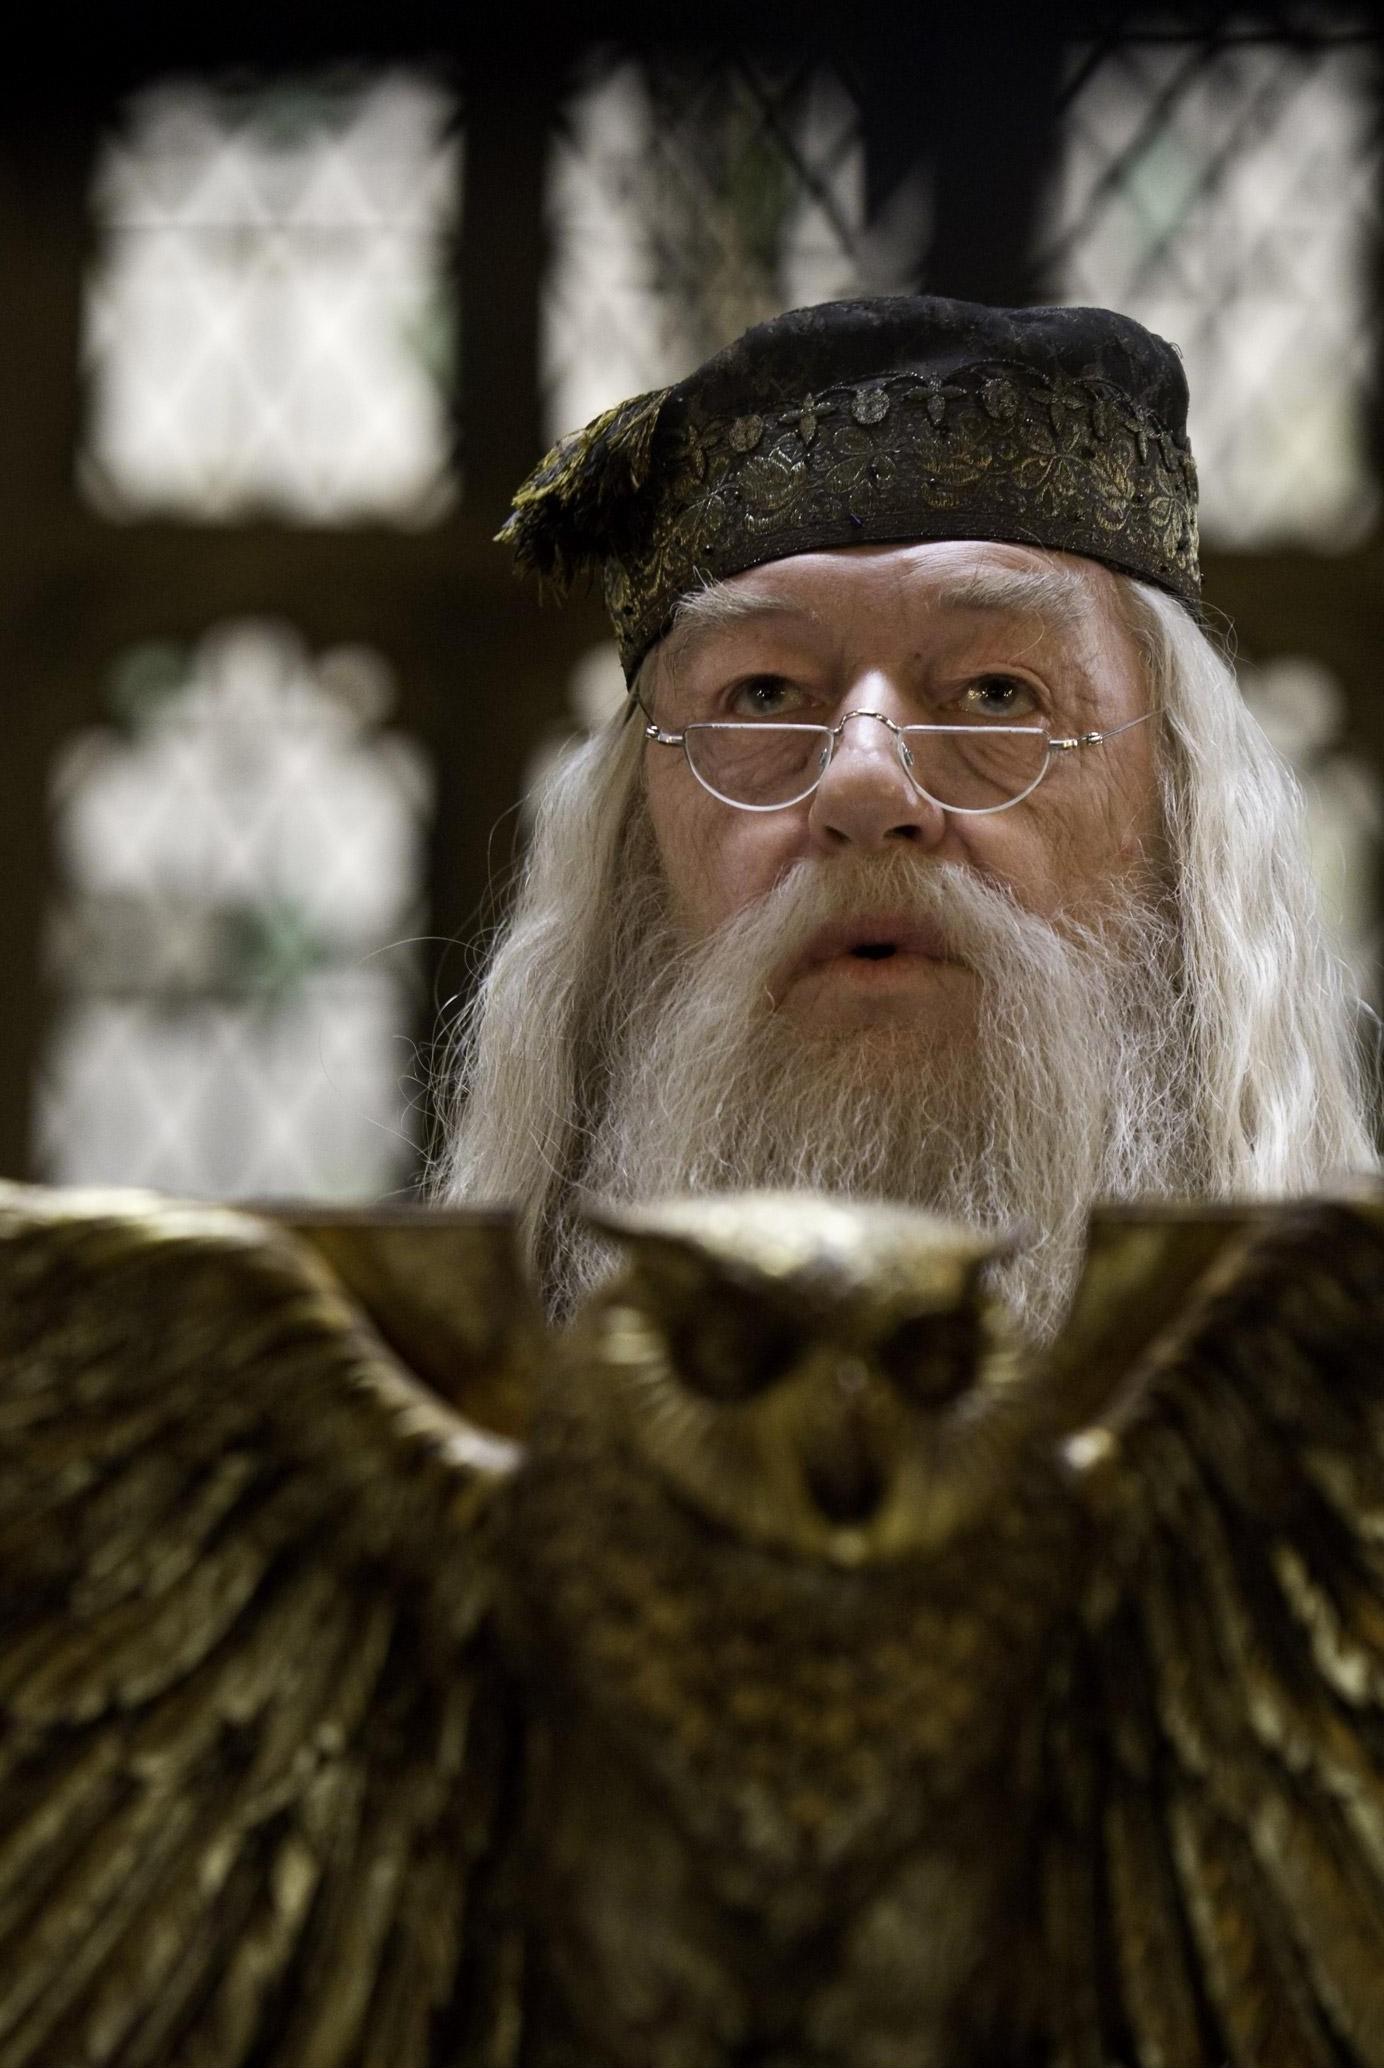 Dumbledore Quote Iphone Wallpaper Albus Dumbledore Wallpapers 62 Images